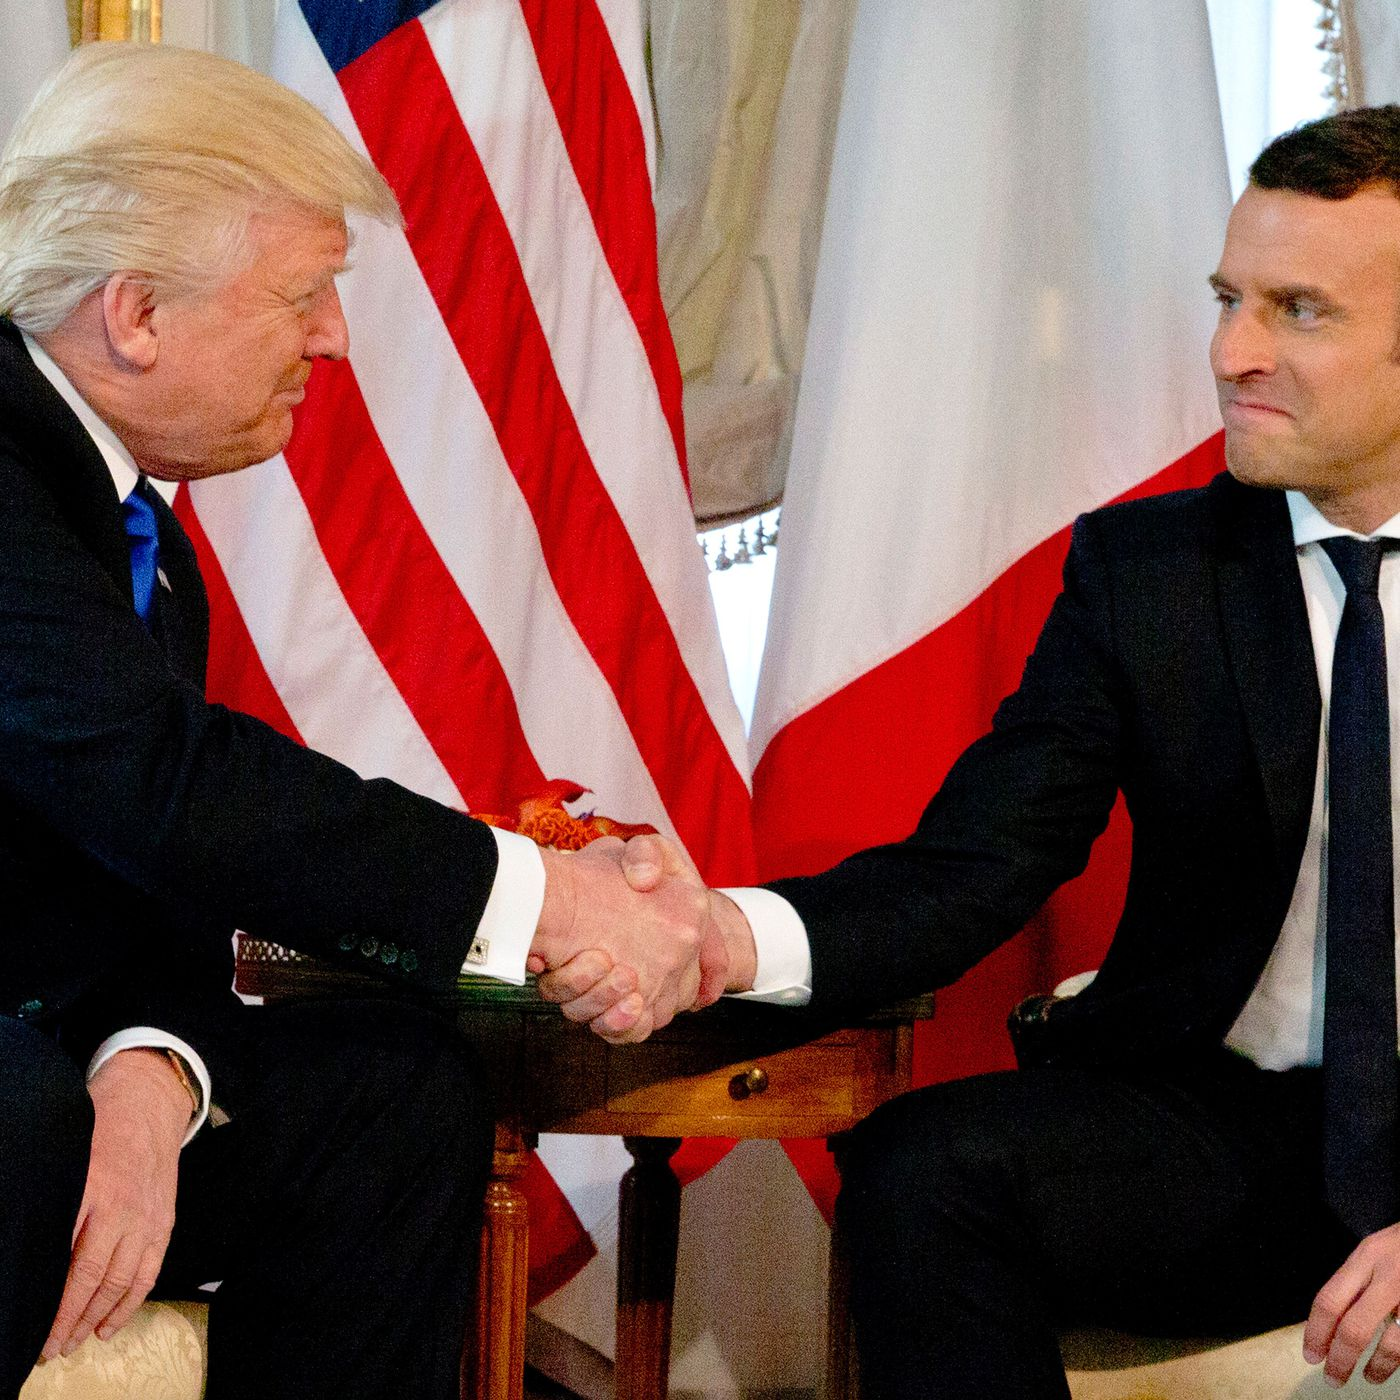 The Political Psychology Behind Trumps Bizarre Handshakes Vox